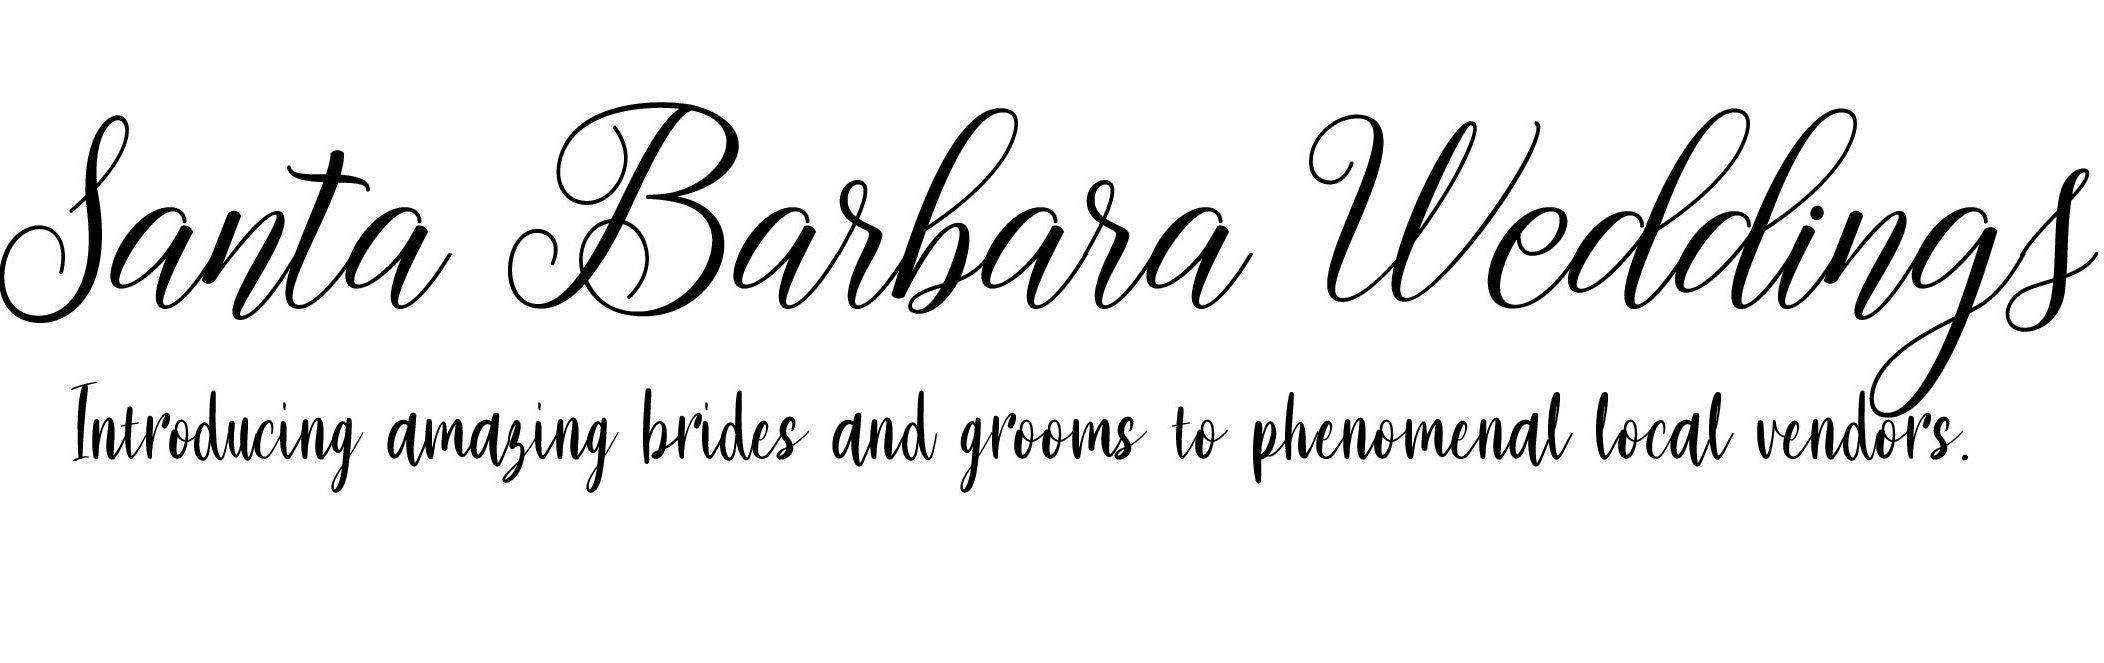 Santa Barbara Weddings